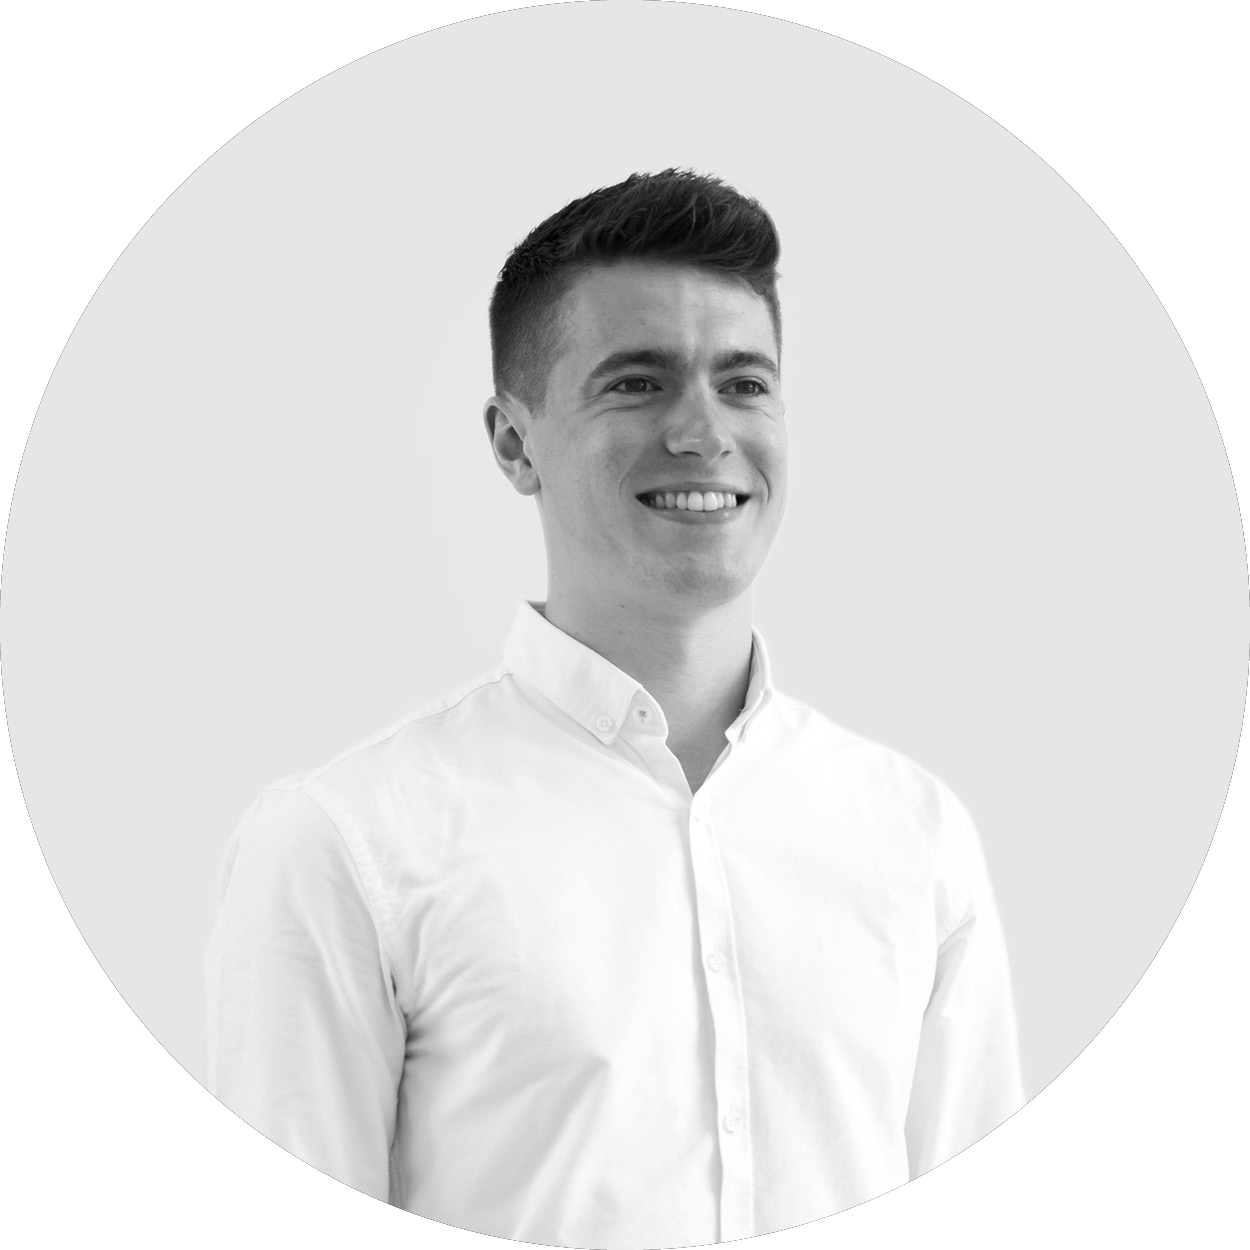 Danny Jackson - Product Design Engineer